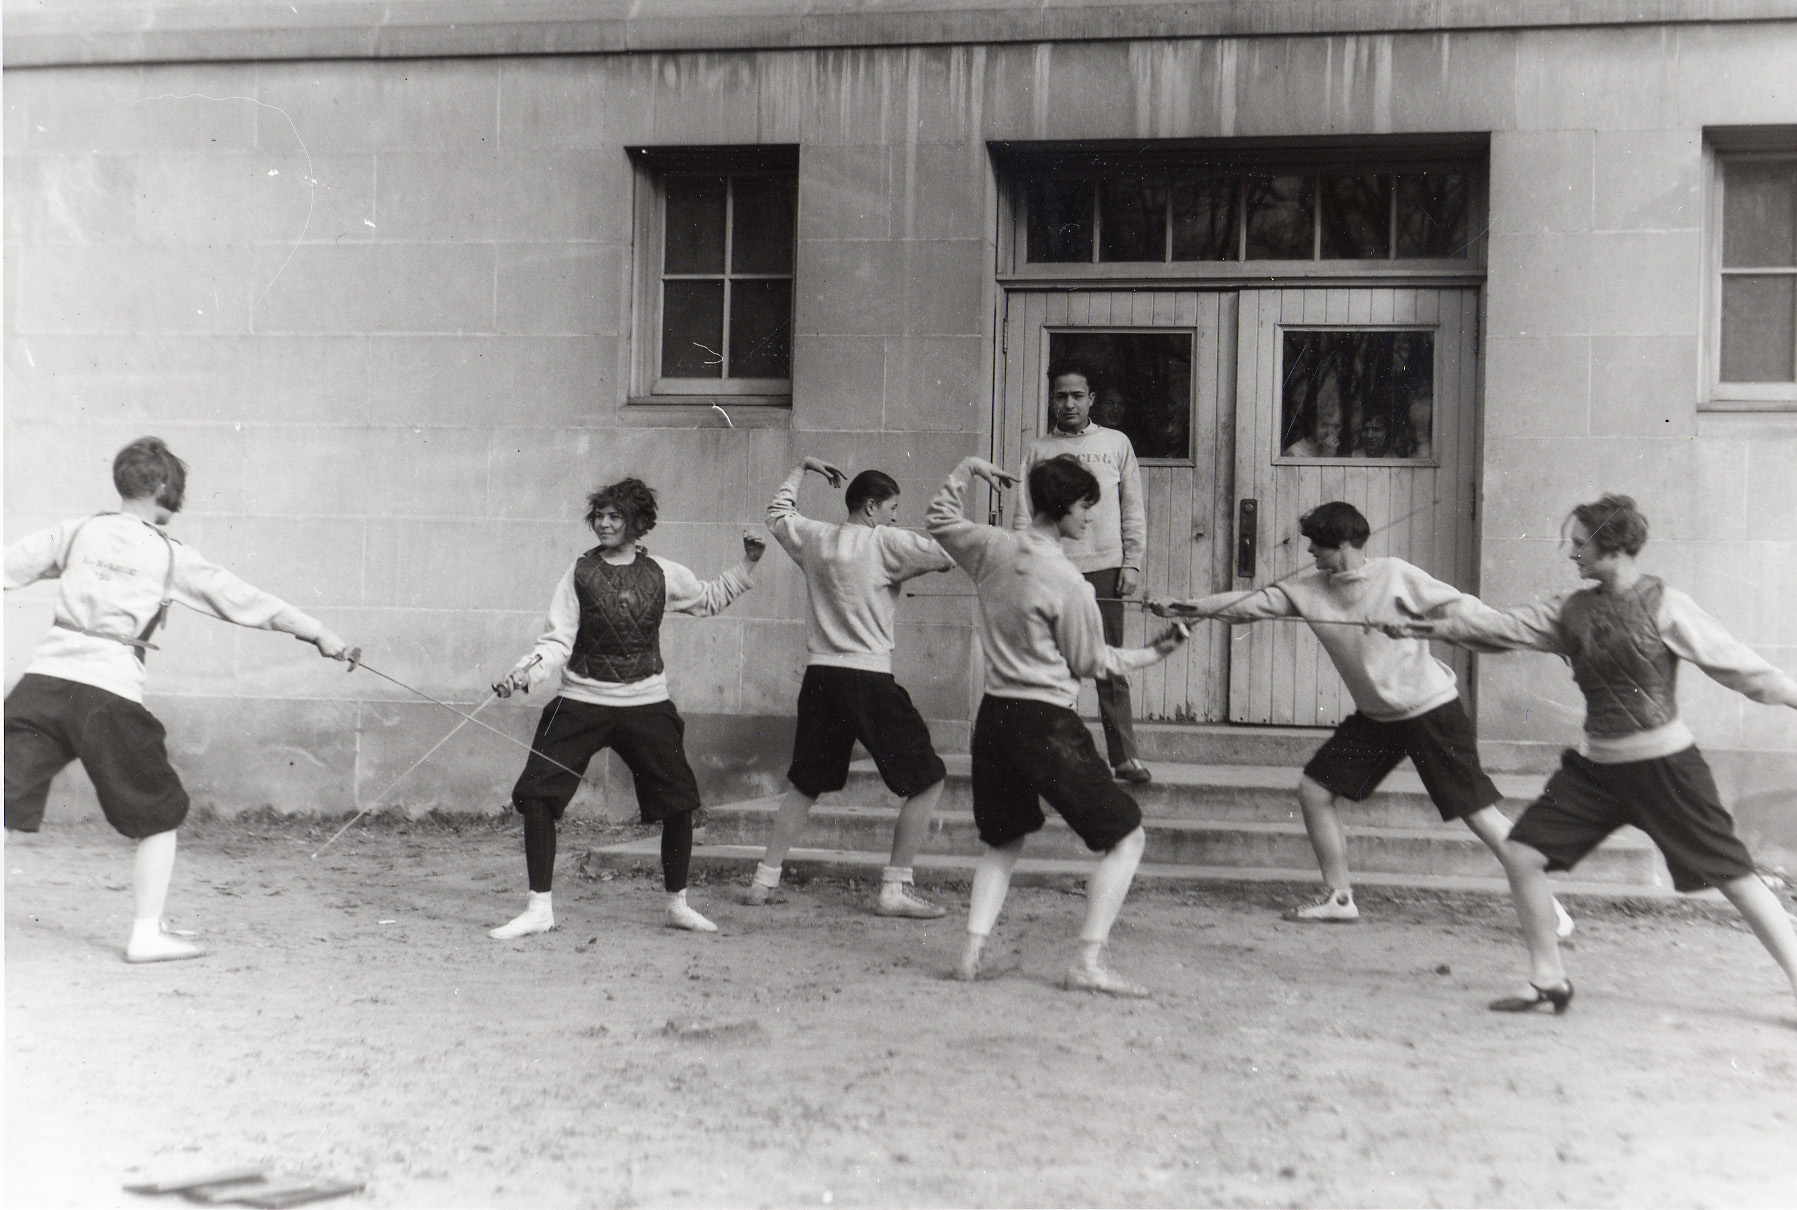 Women's Fencing Practice, circa 1926